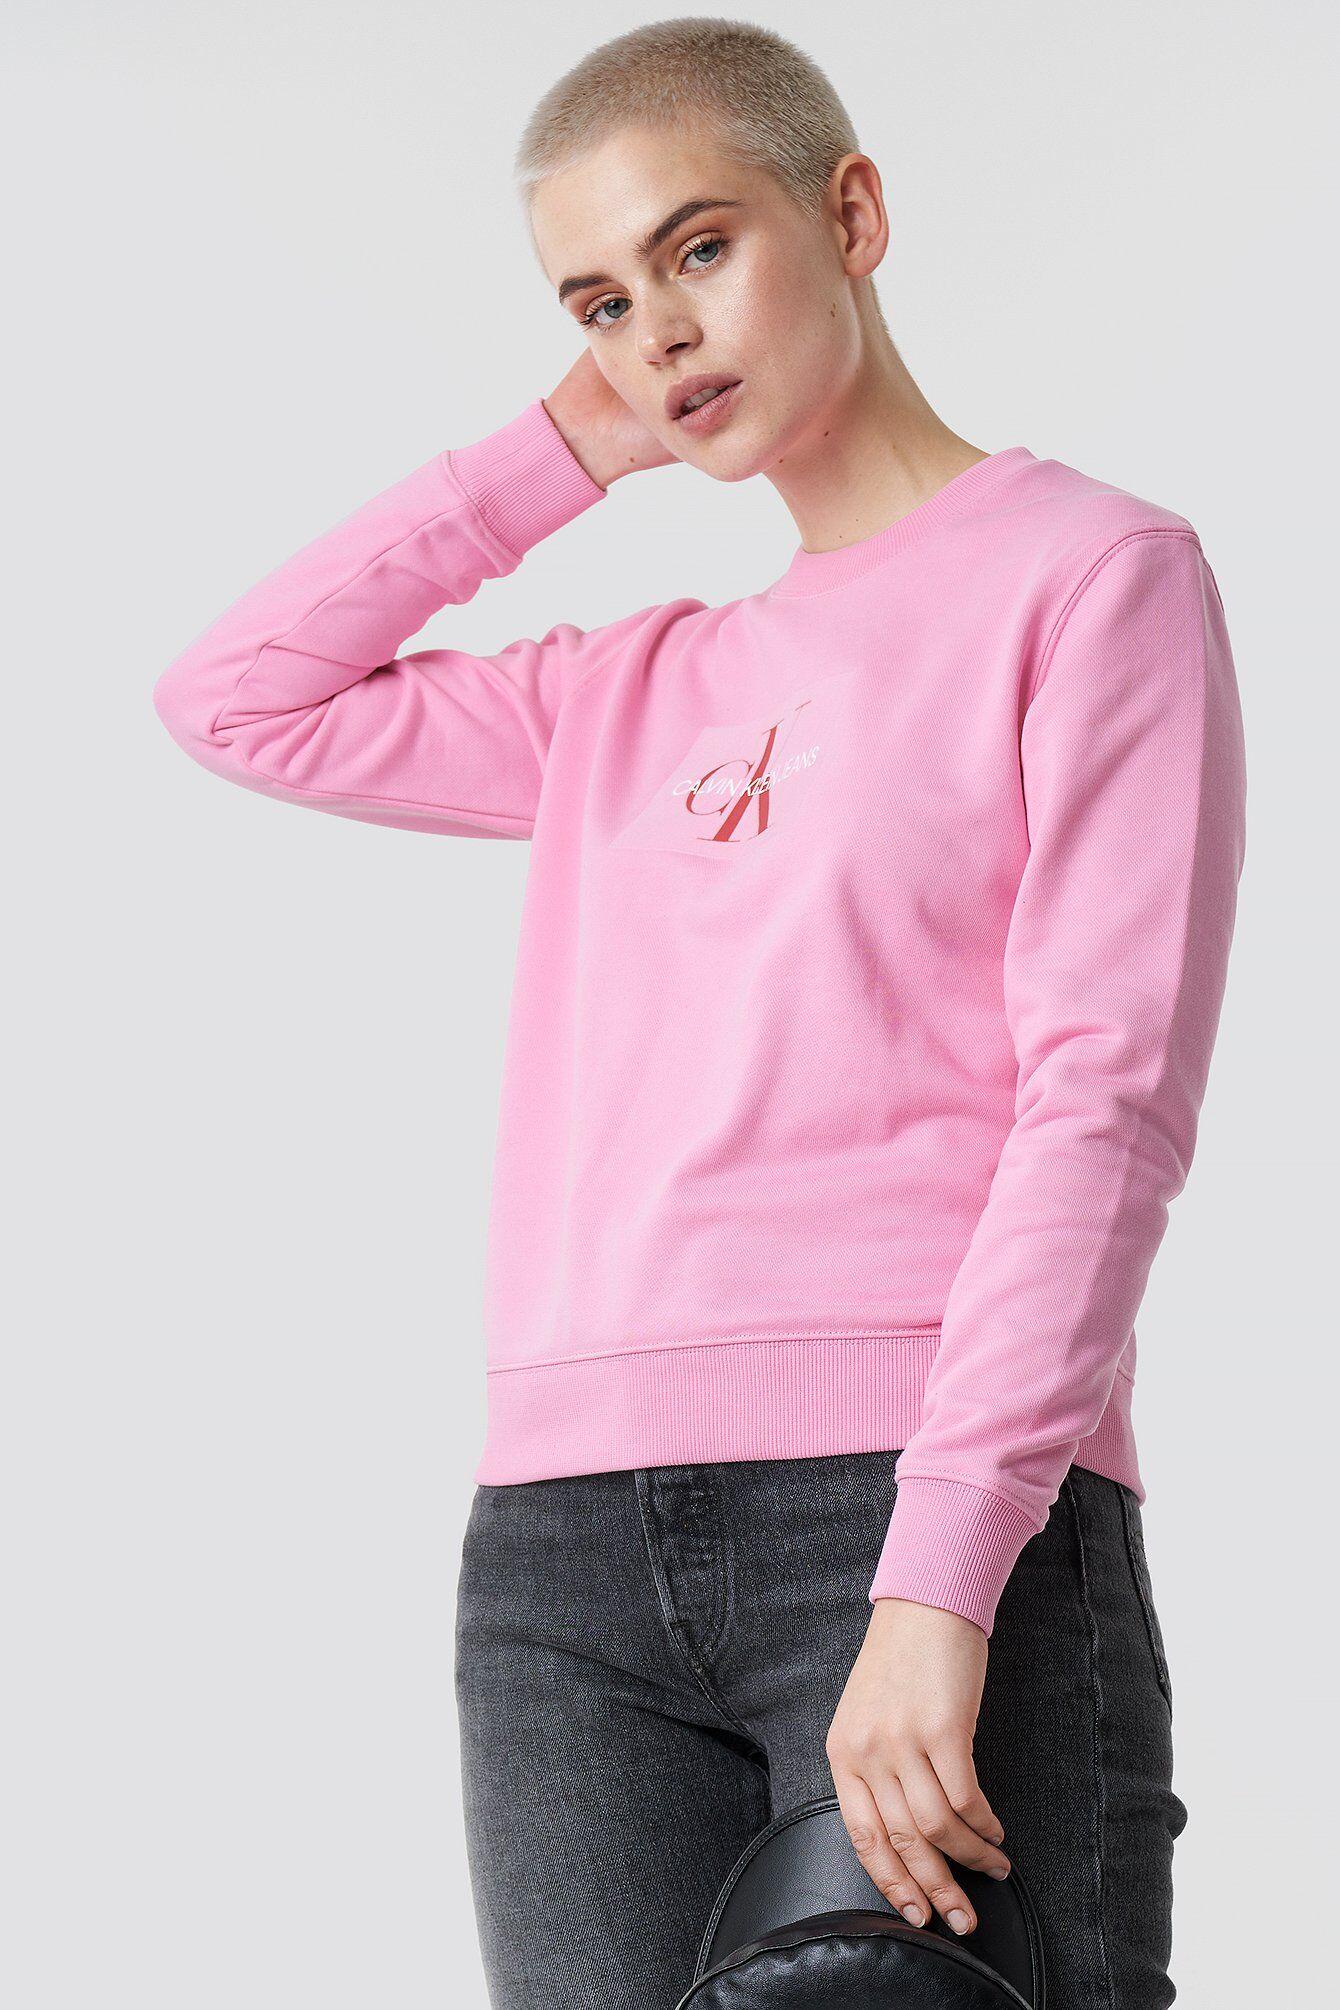 Calvin Klein Monogram Flock Box Logo Reg Crewneck - Pink